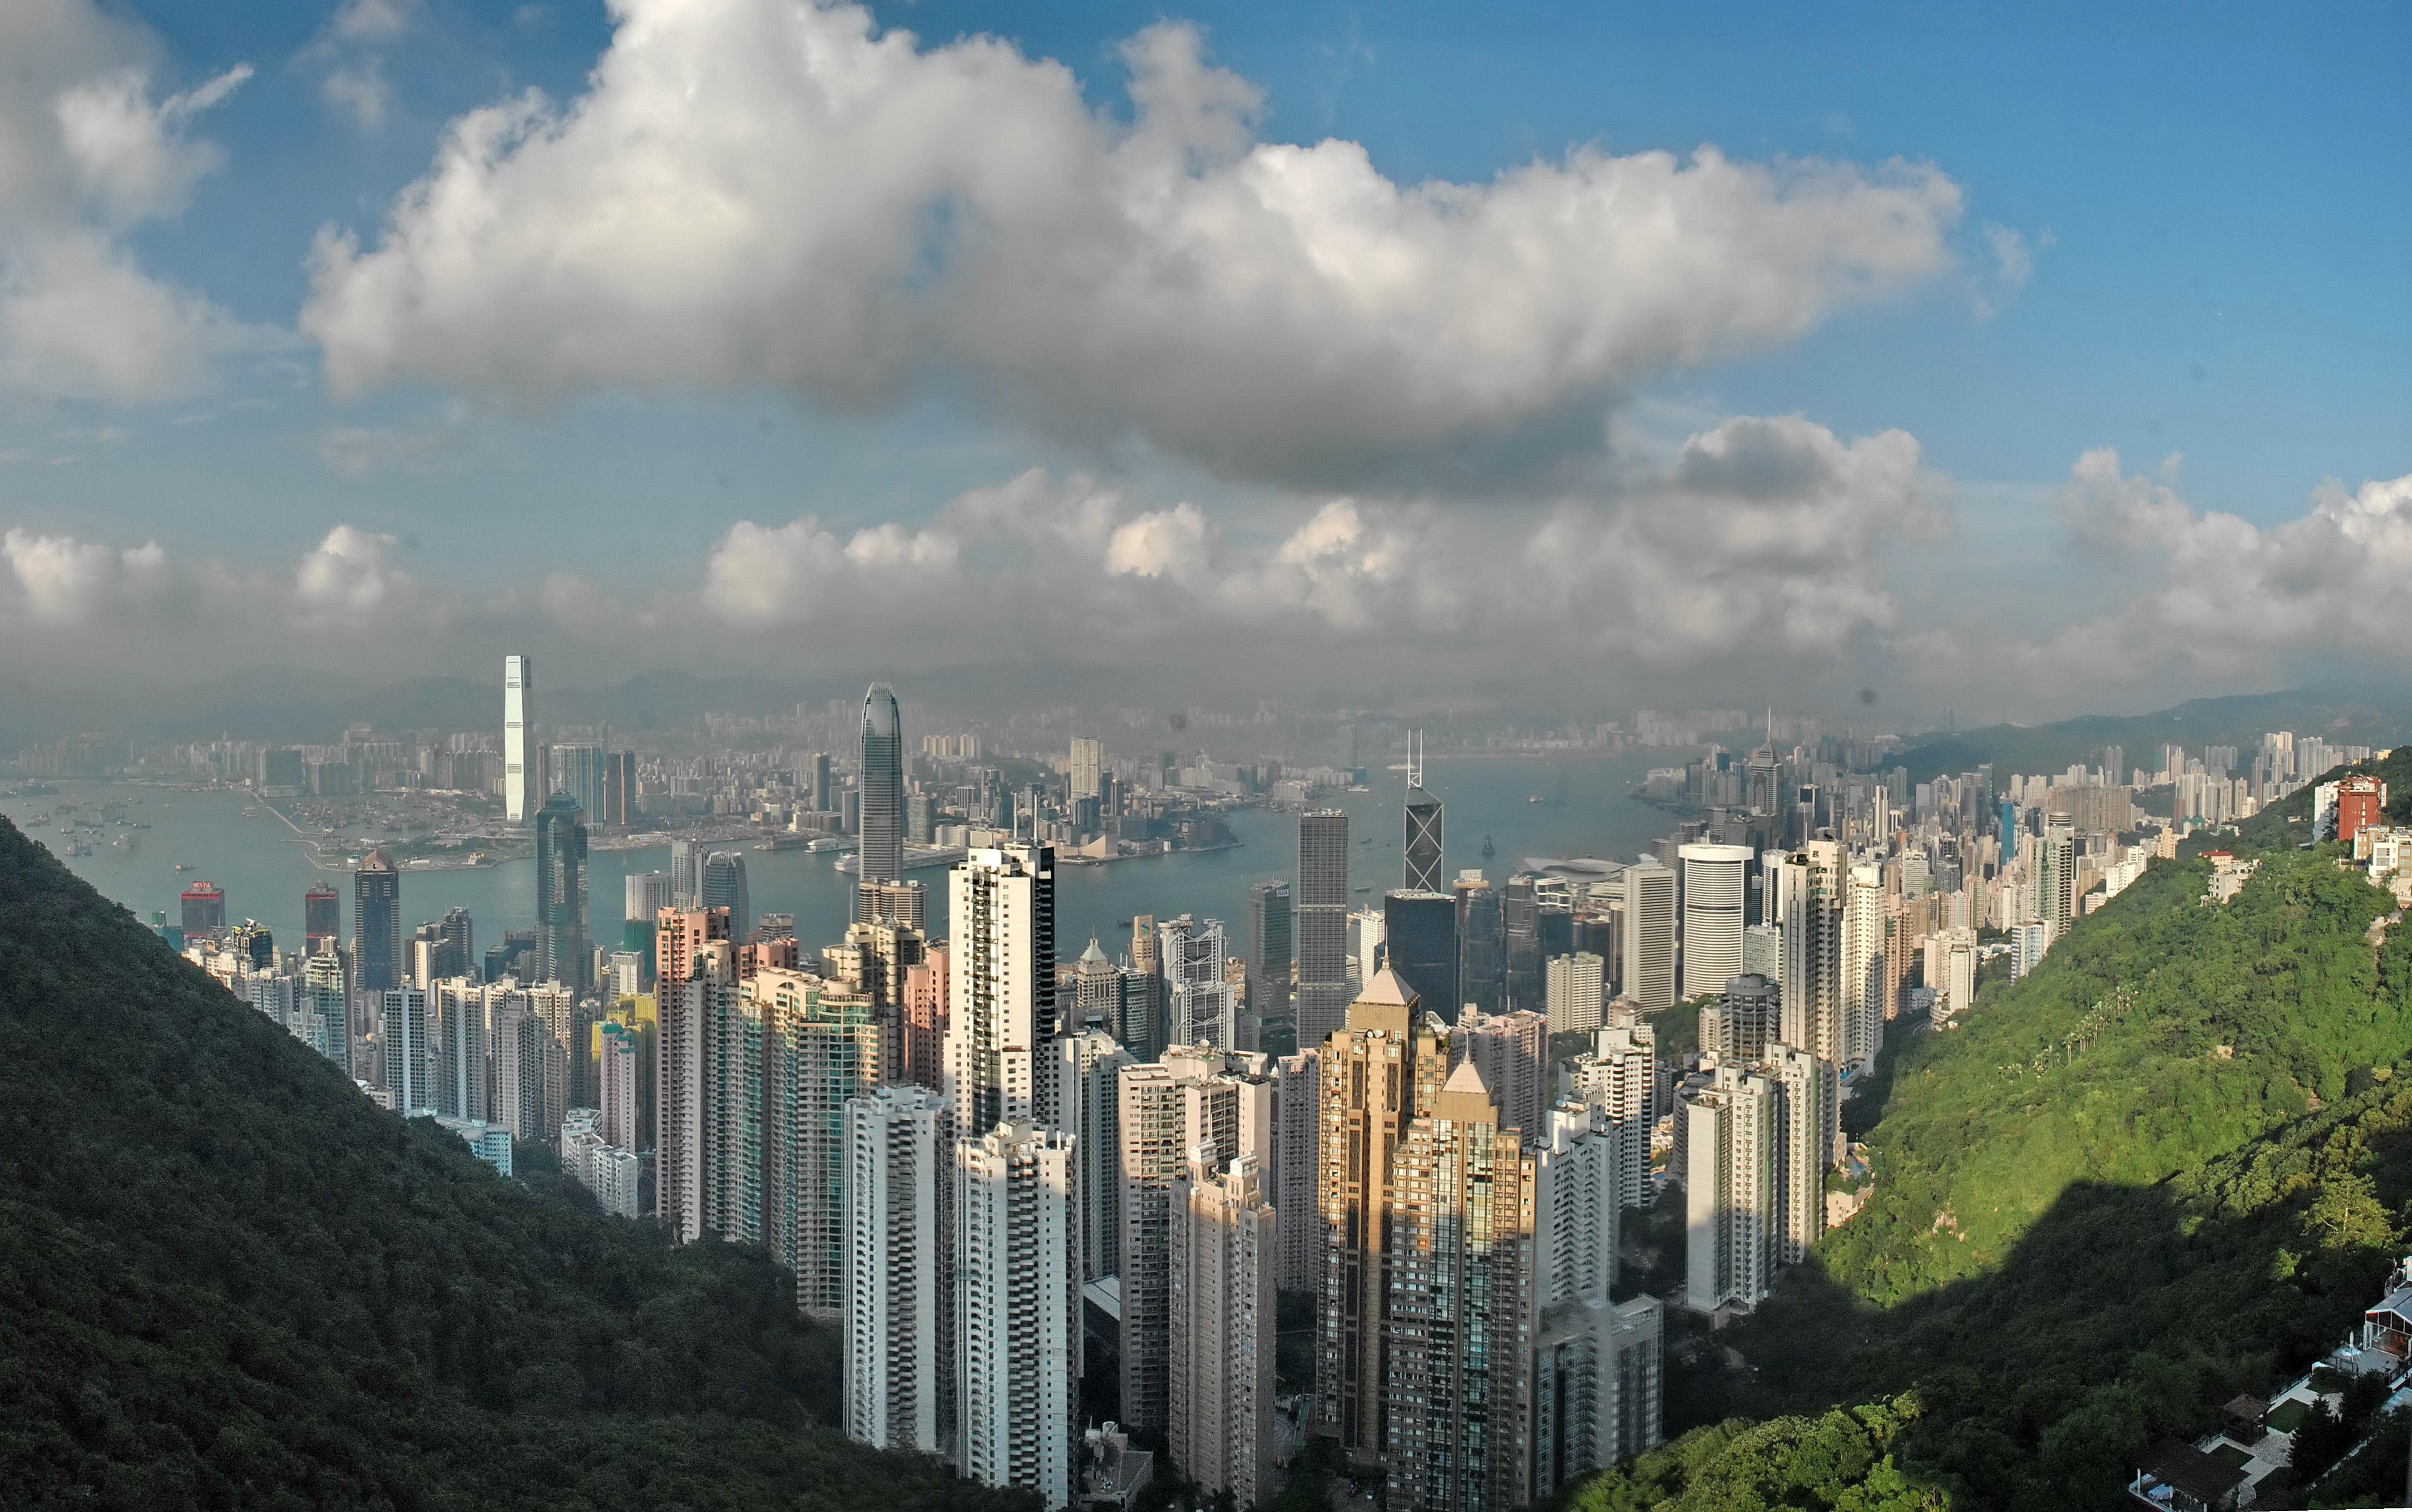 Cina '10 Honk-Kong 002